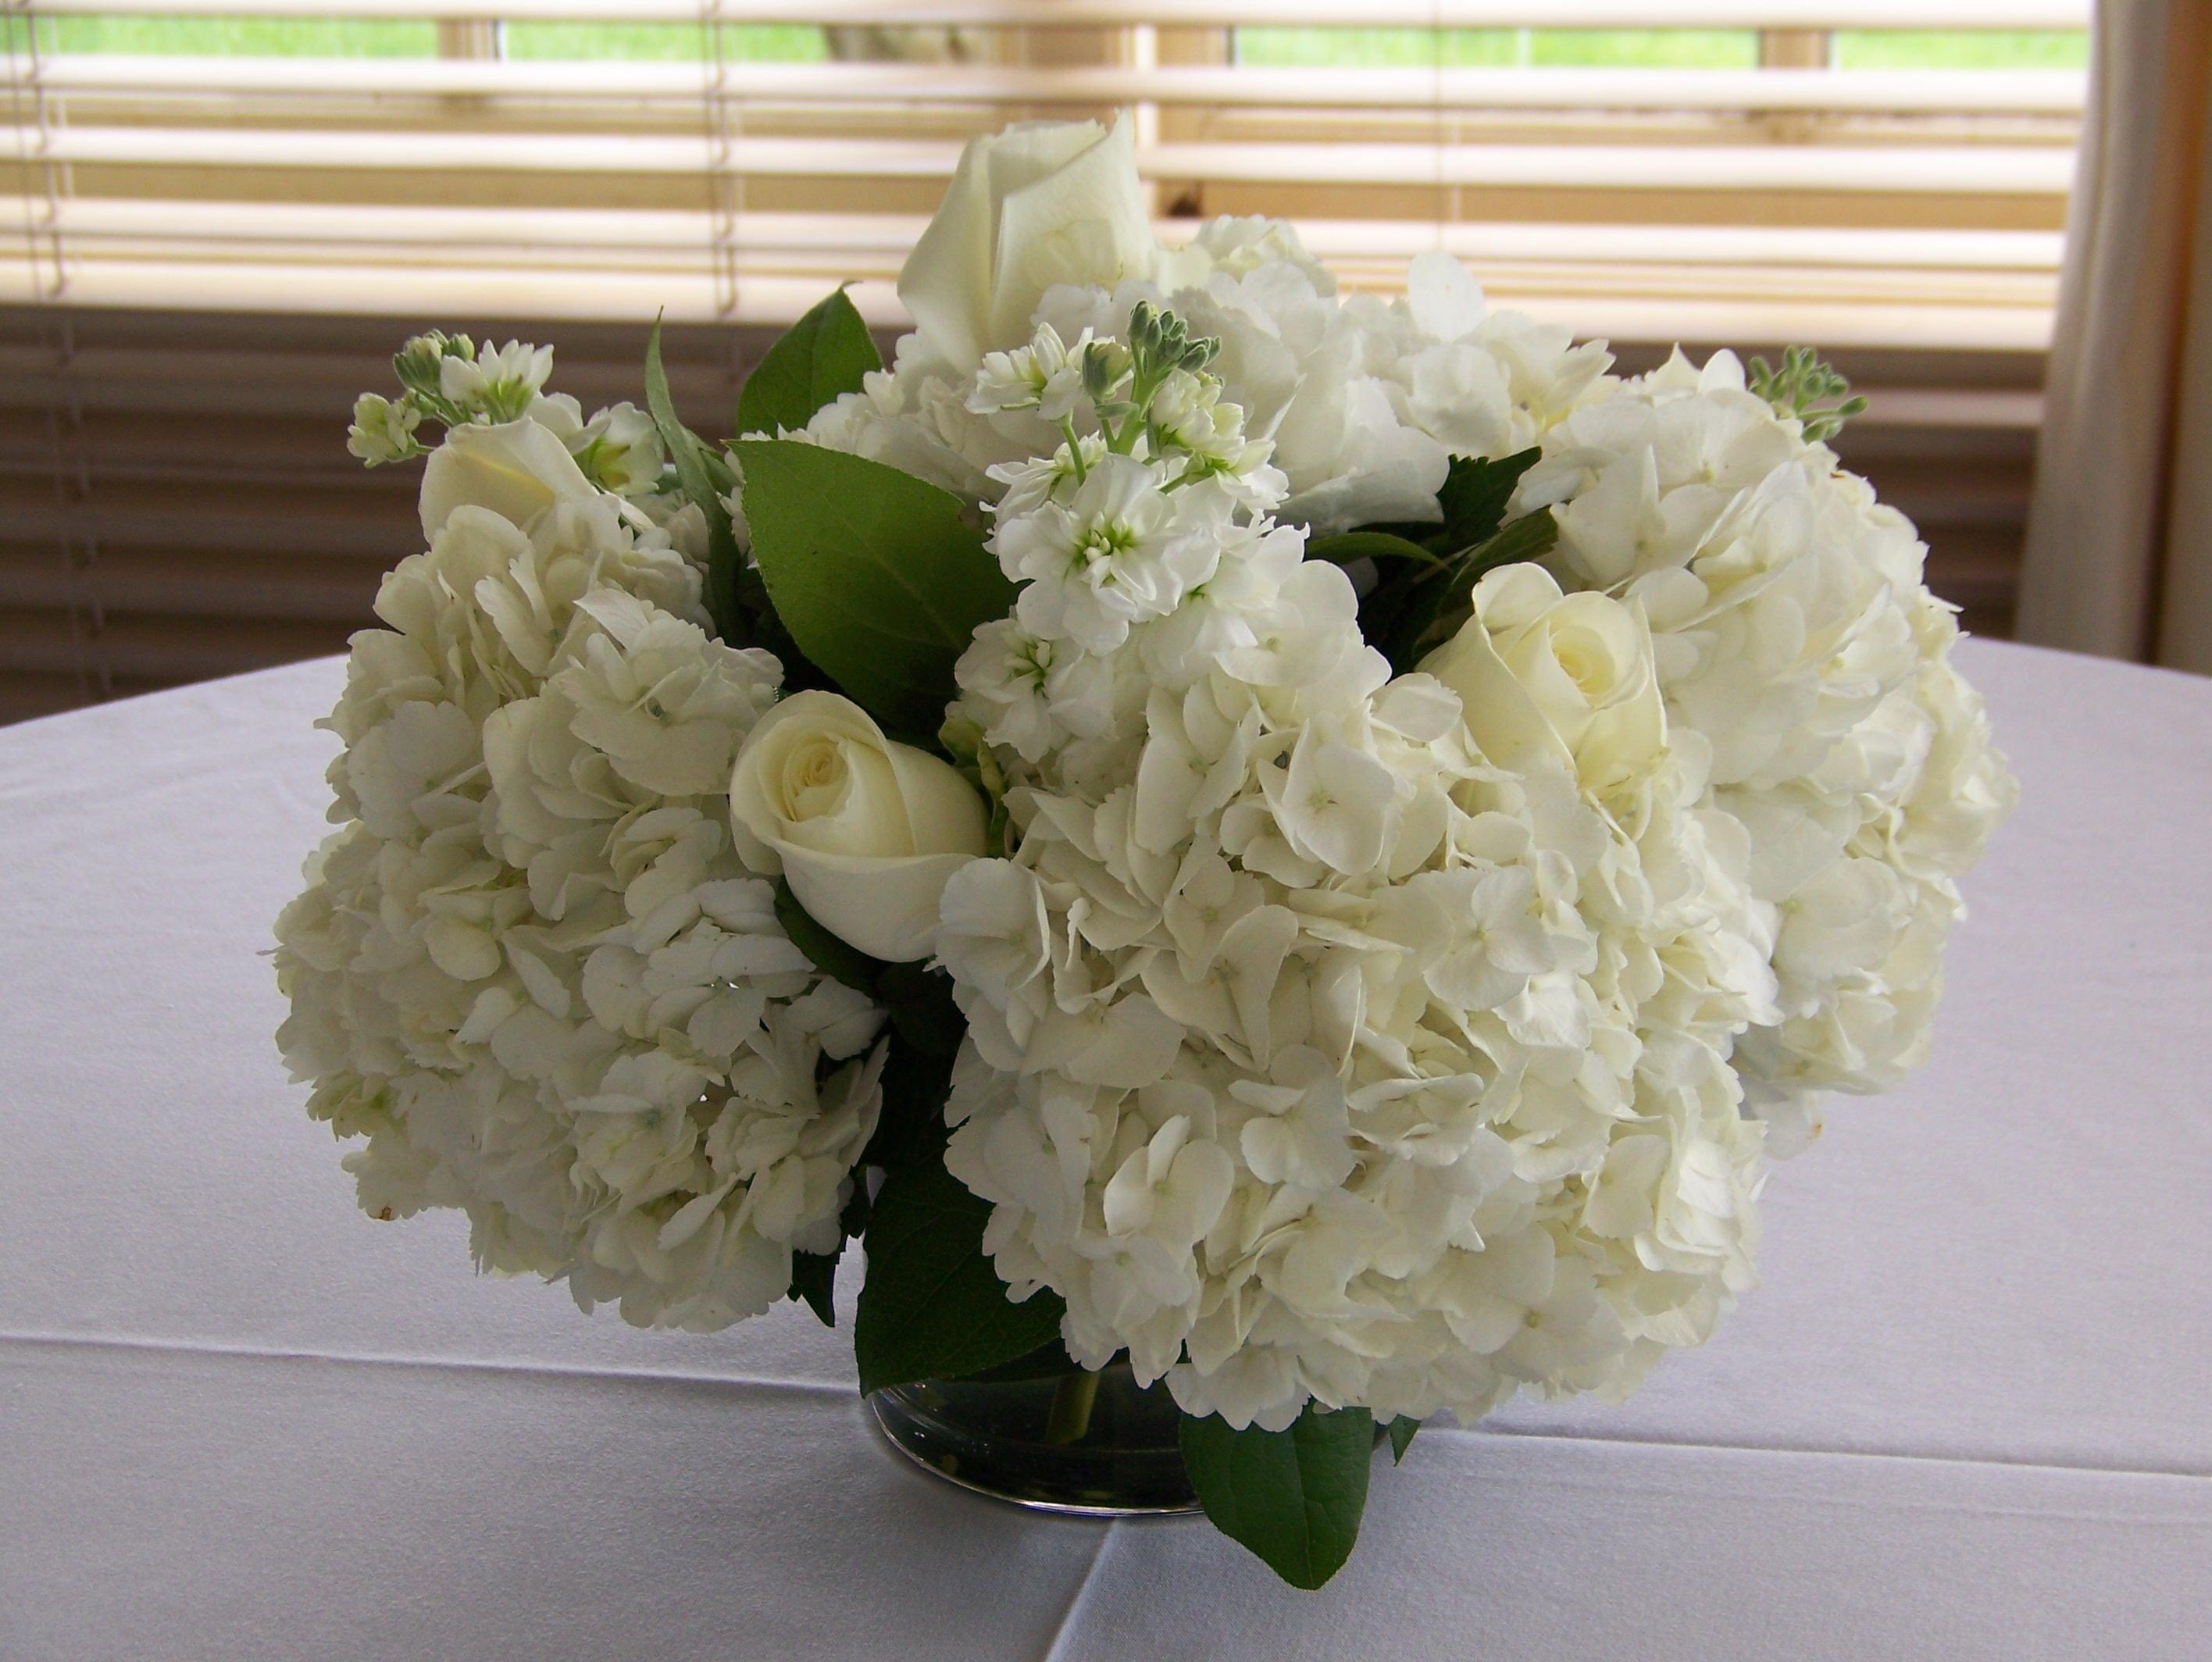 Hydrangea Rose Wedding Centerpieces: Our flowers chicago florist ...